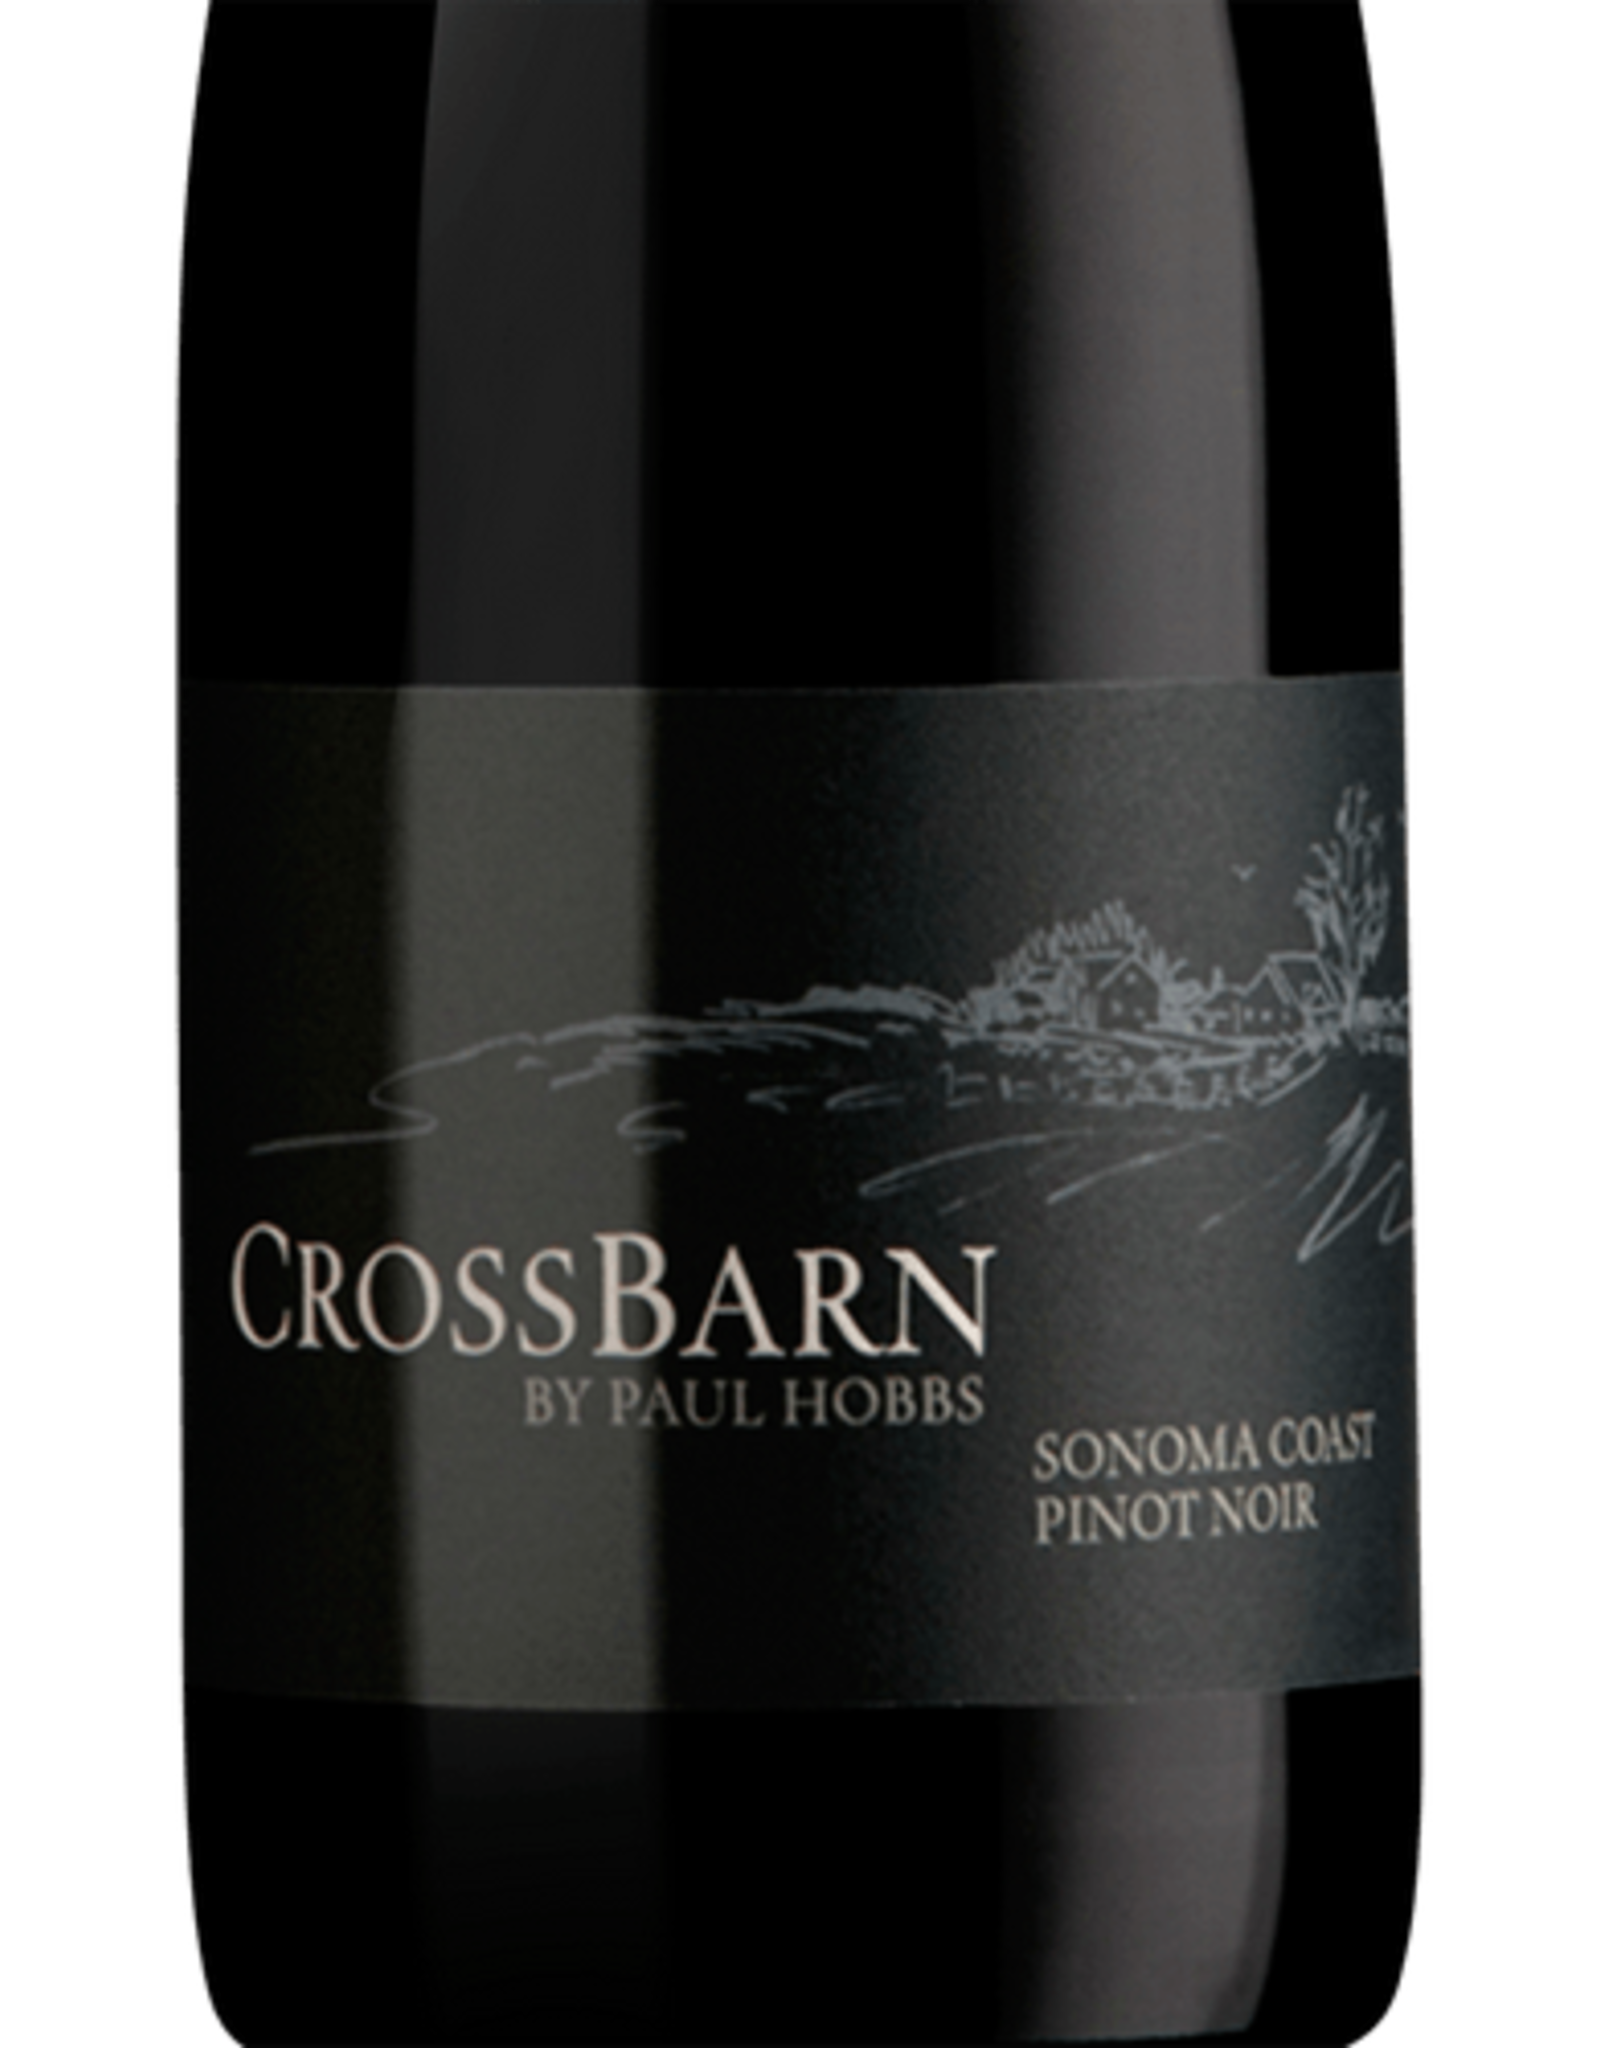 Paul Hobbs Crossbarn Pinot Noir 2017